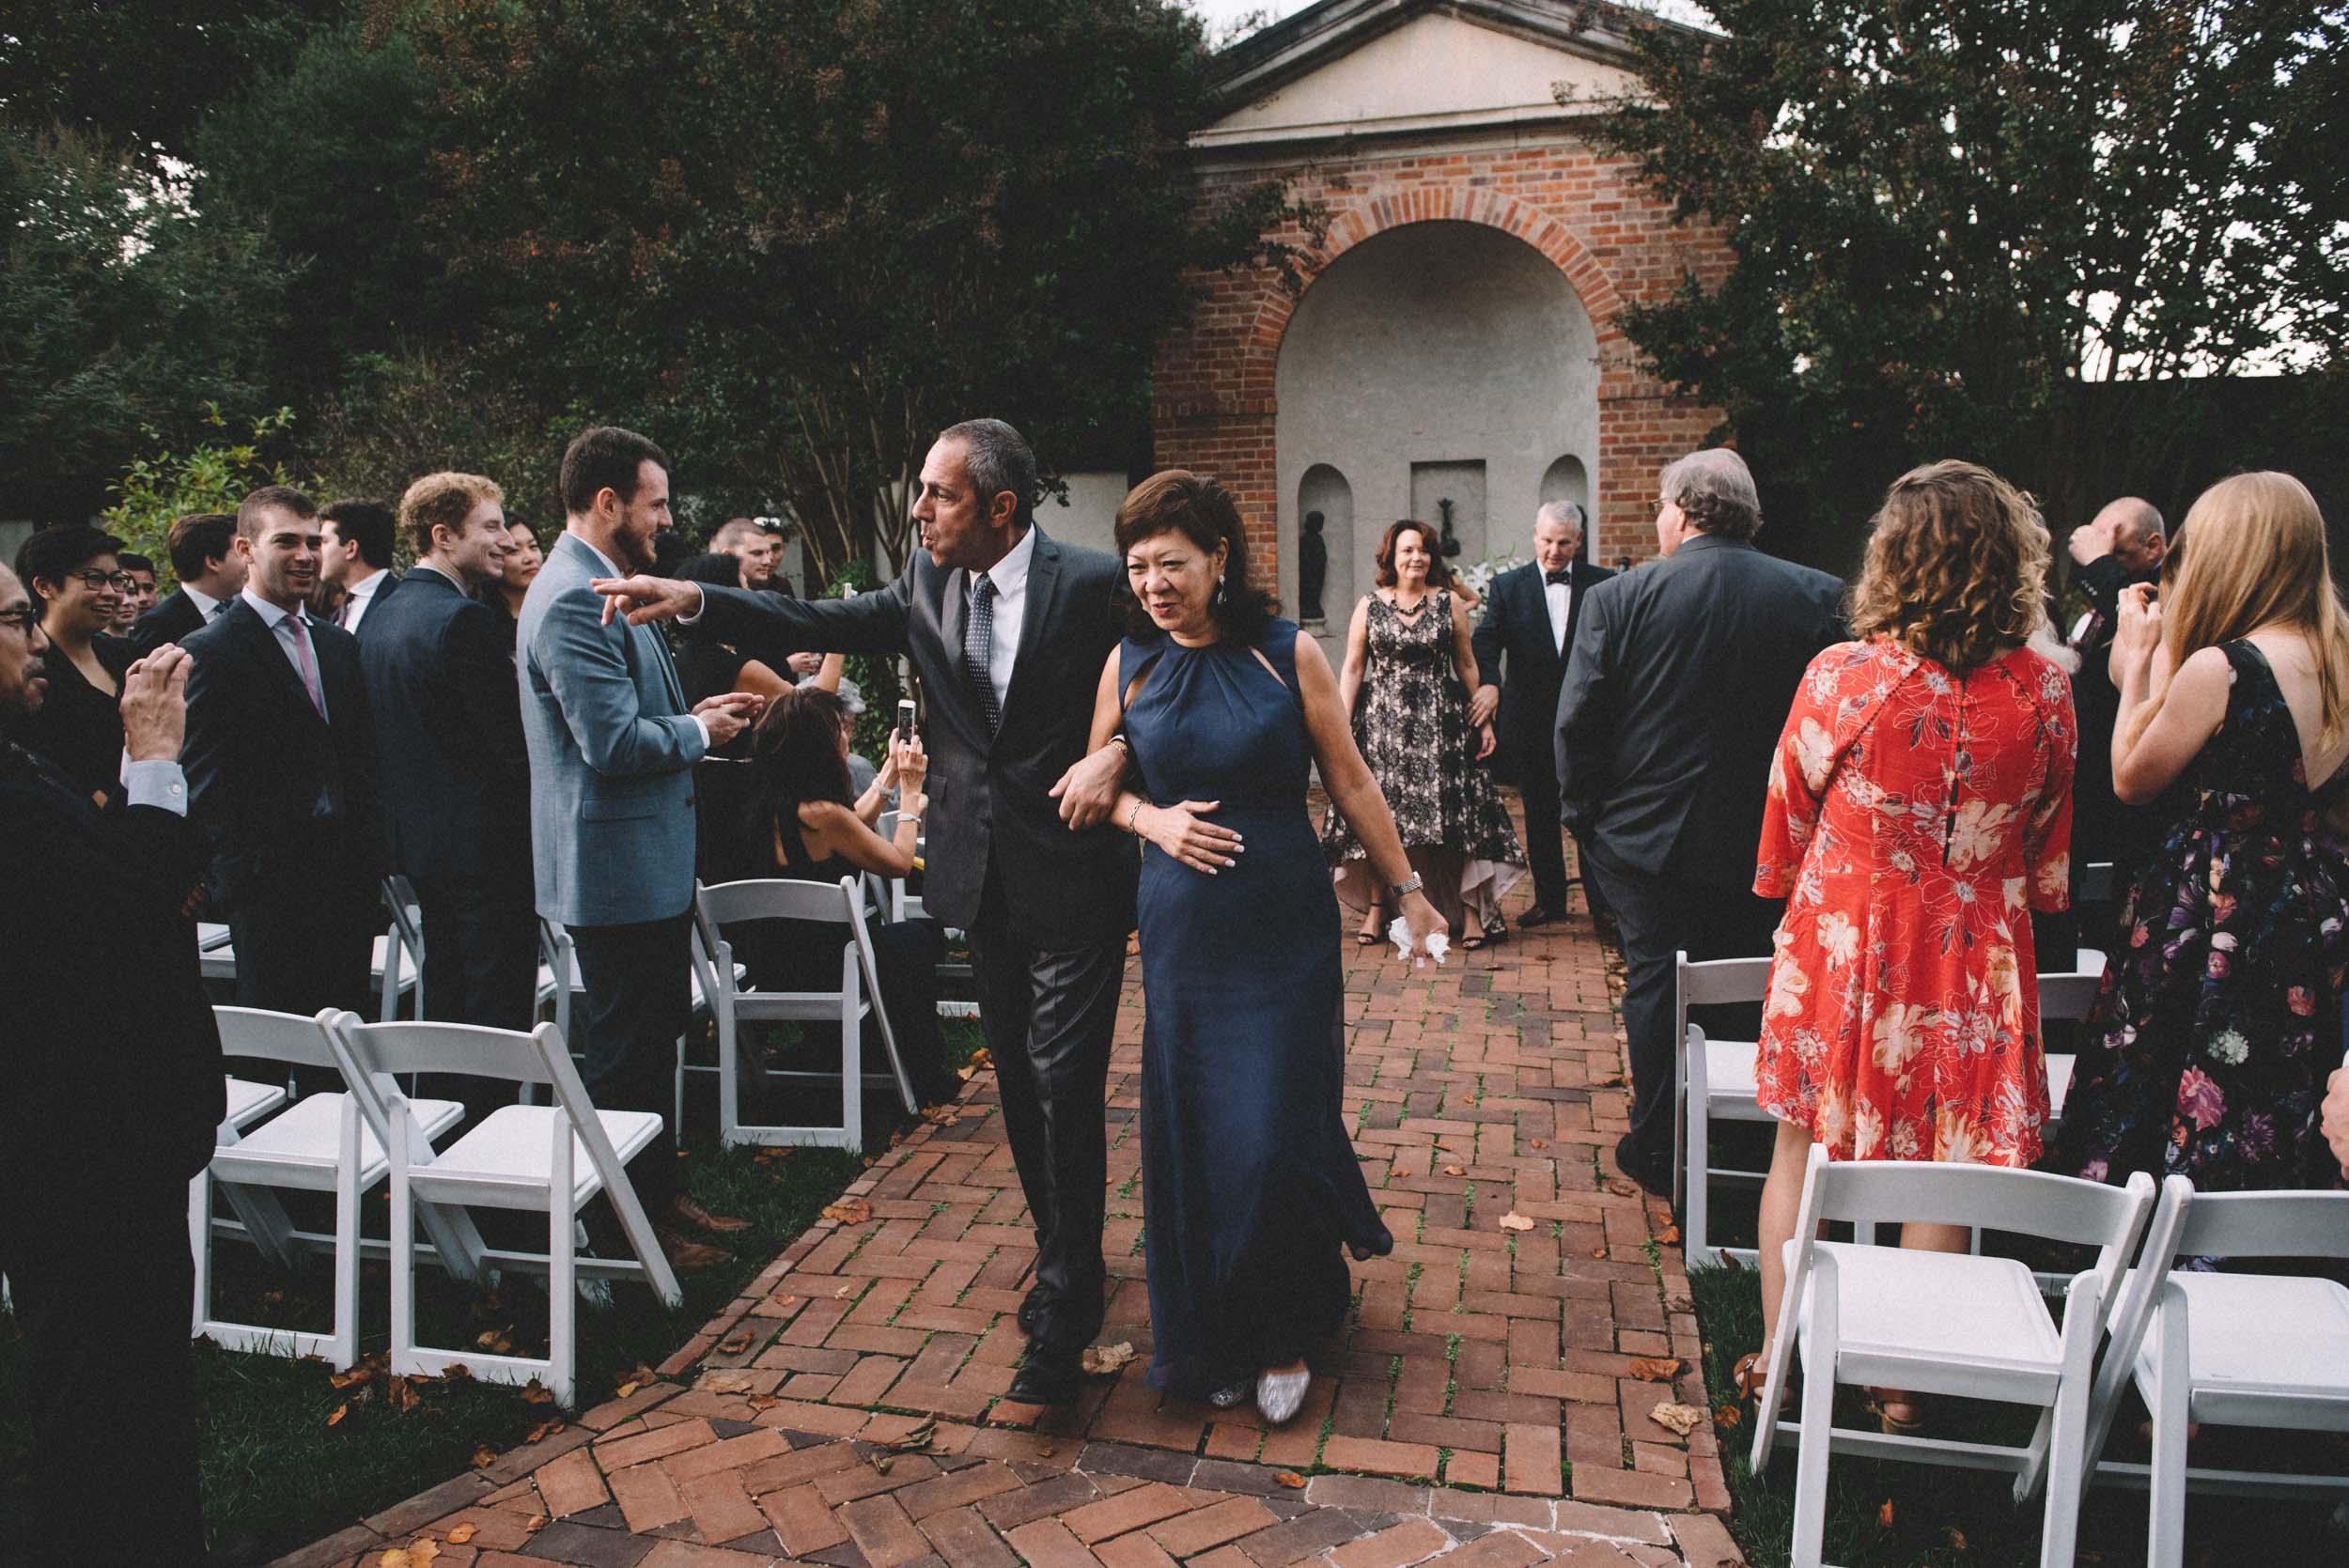 Dumbarton-House-wedding-54.jpg